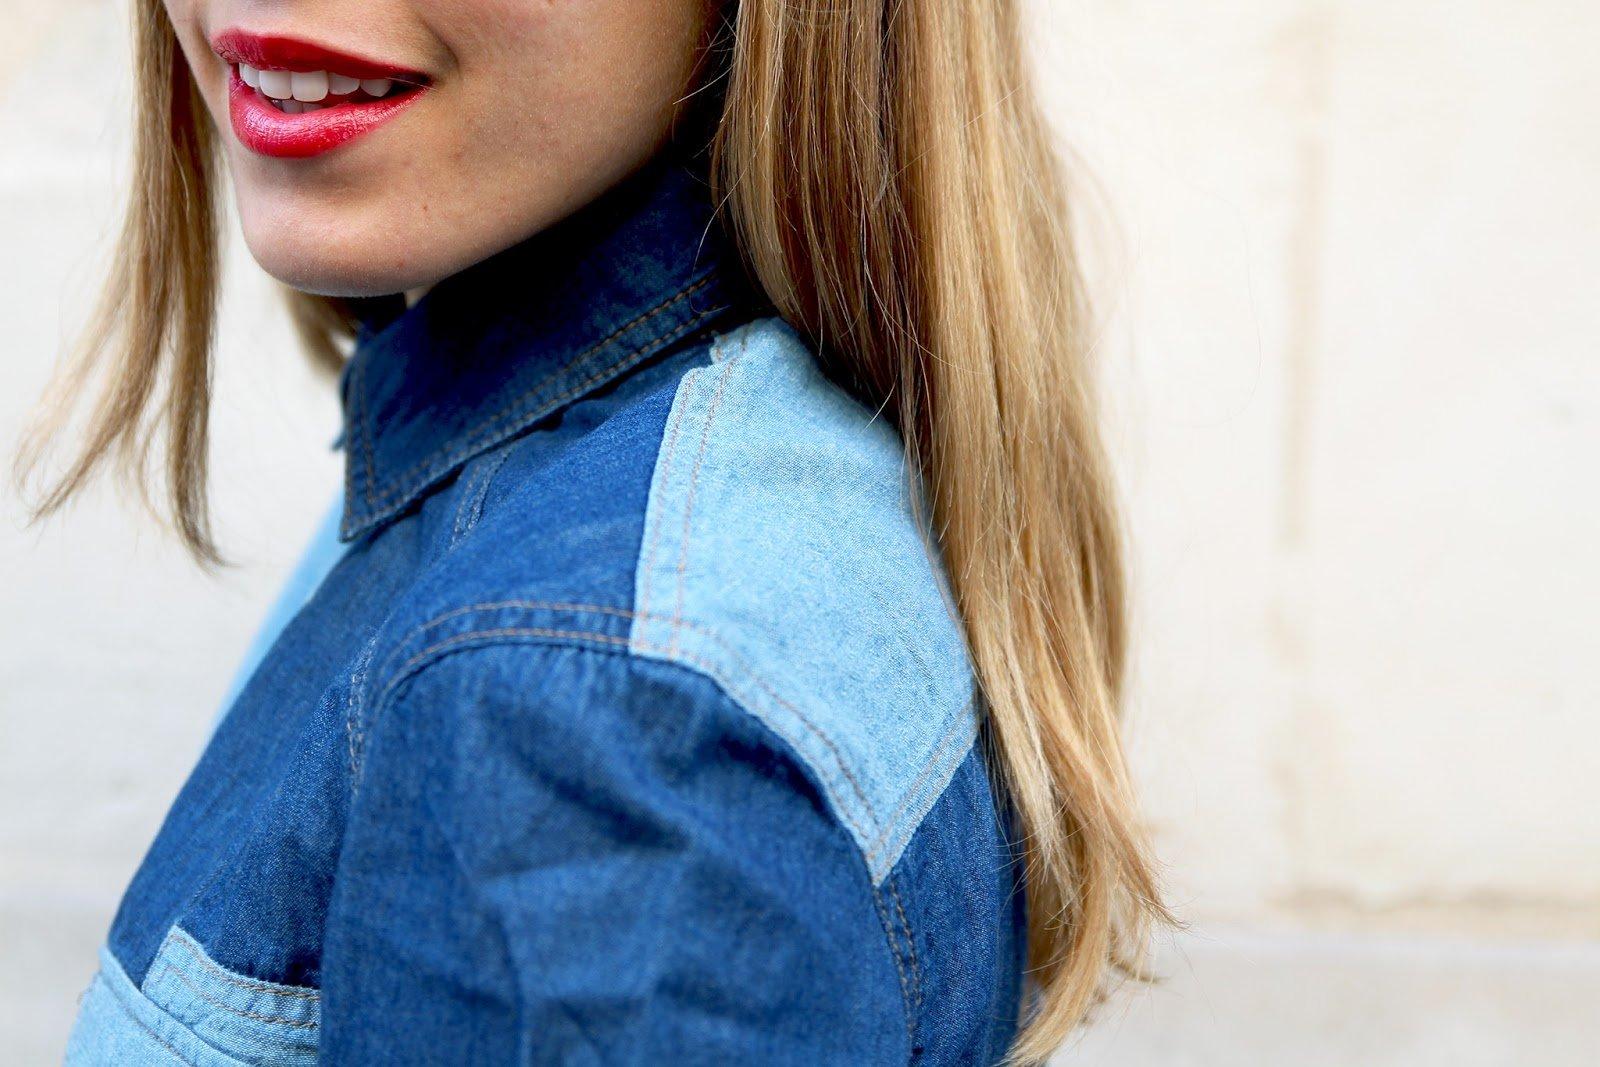 chemise jean bicolore